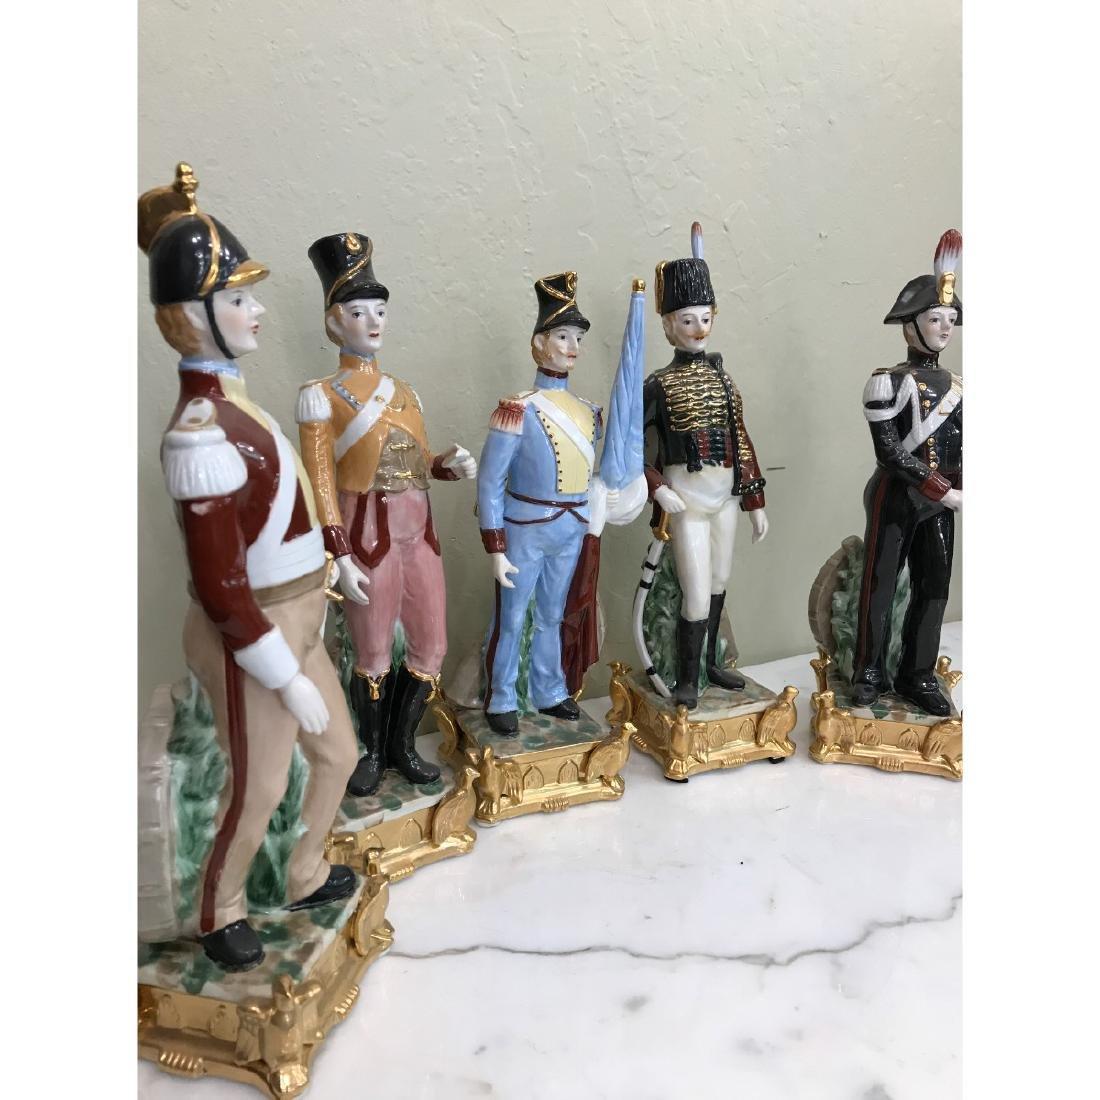 Set of 5 Porcelain Soldier Statues - 2